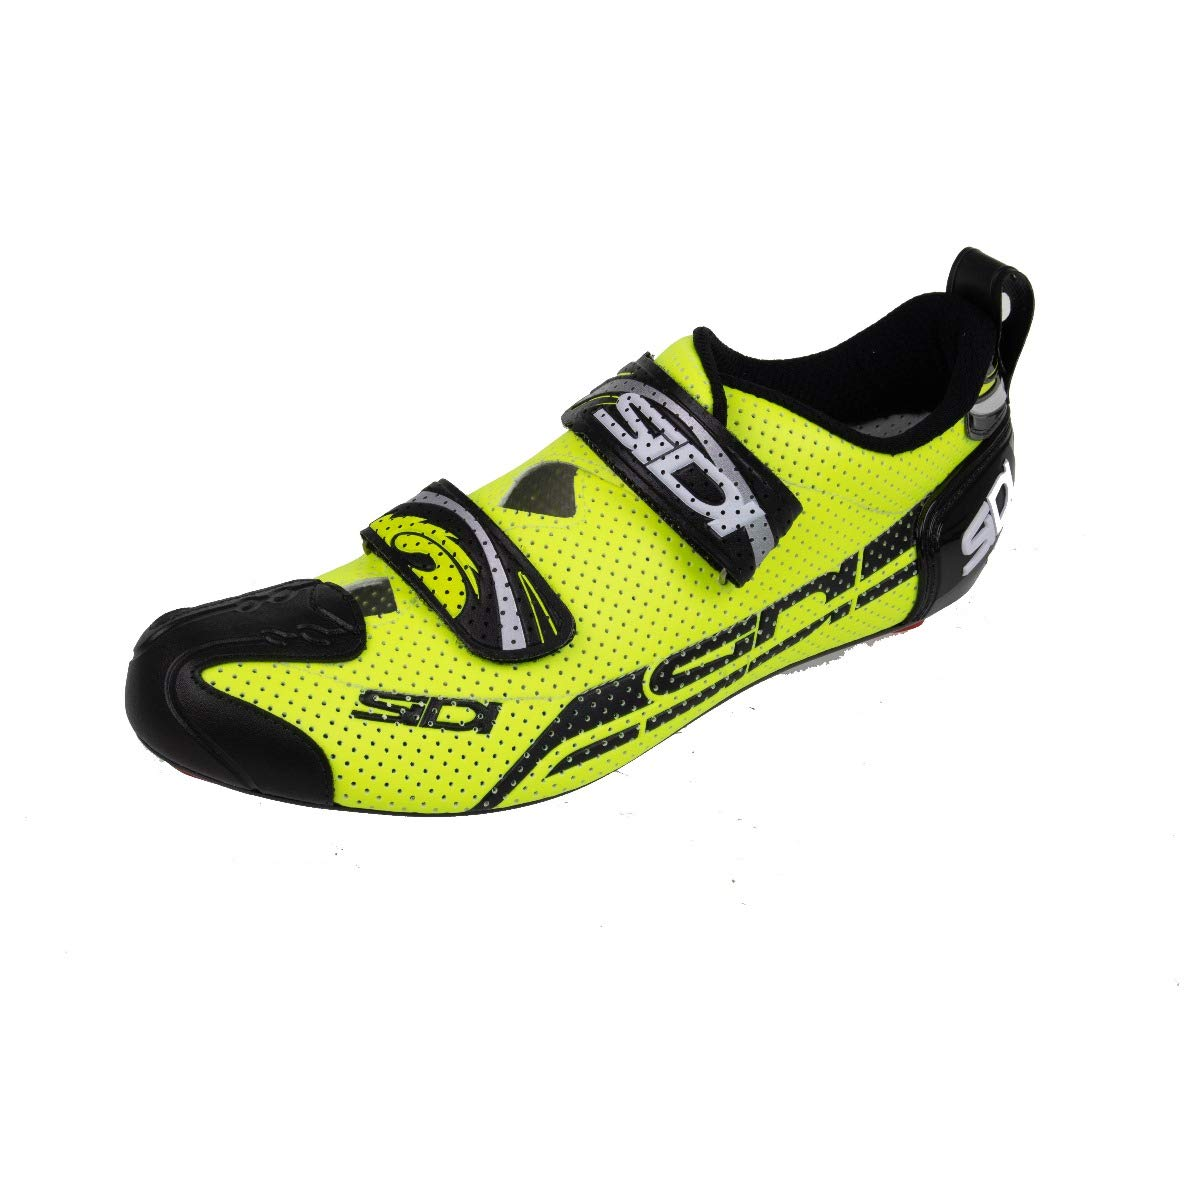 Amazon.com: Sidi T4 Air Carbon Triathlon Shoe Yellow Fluo ...